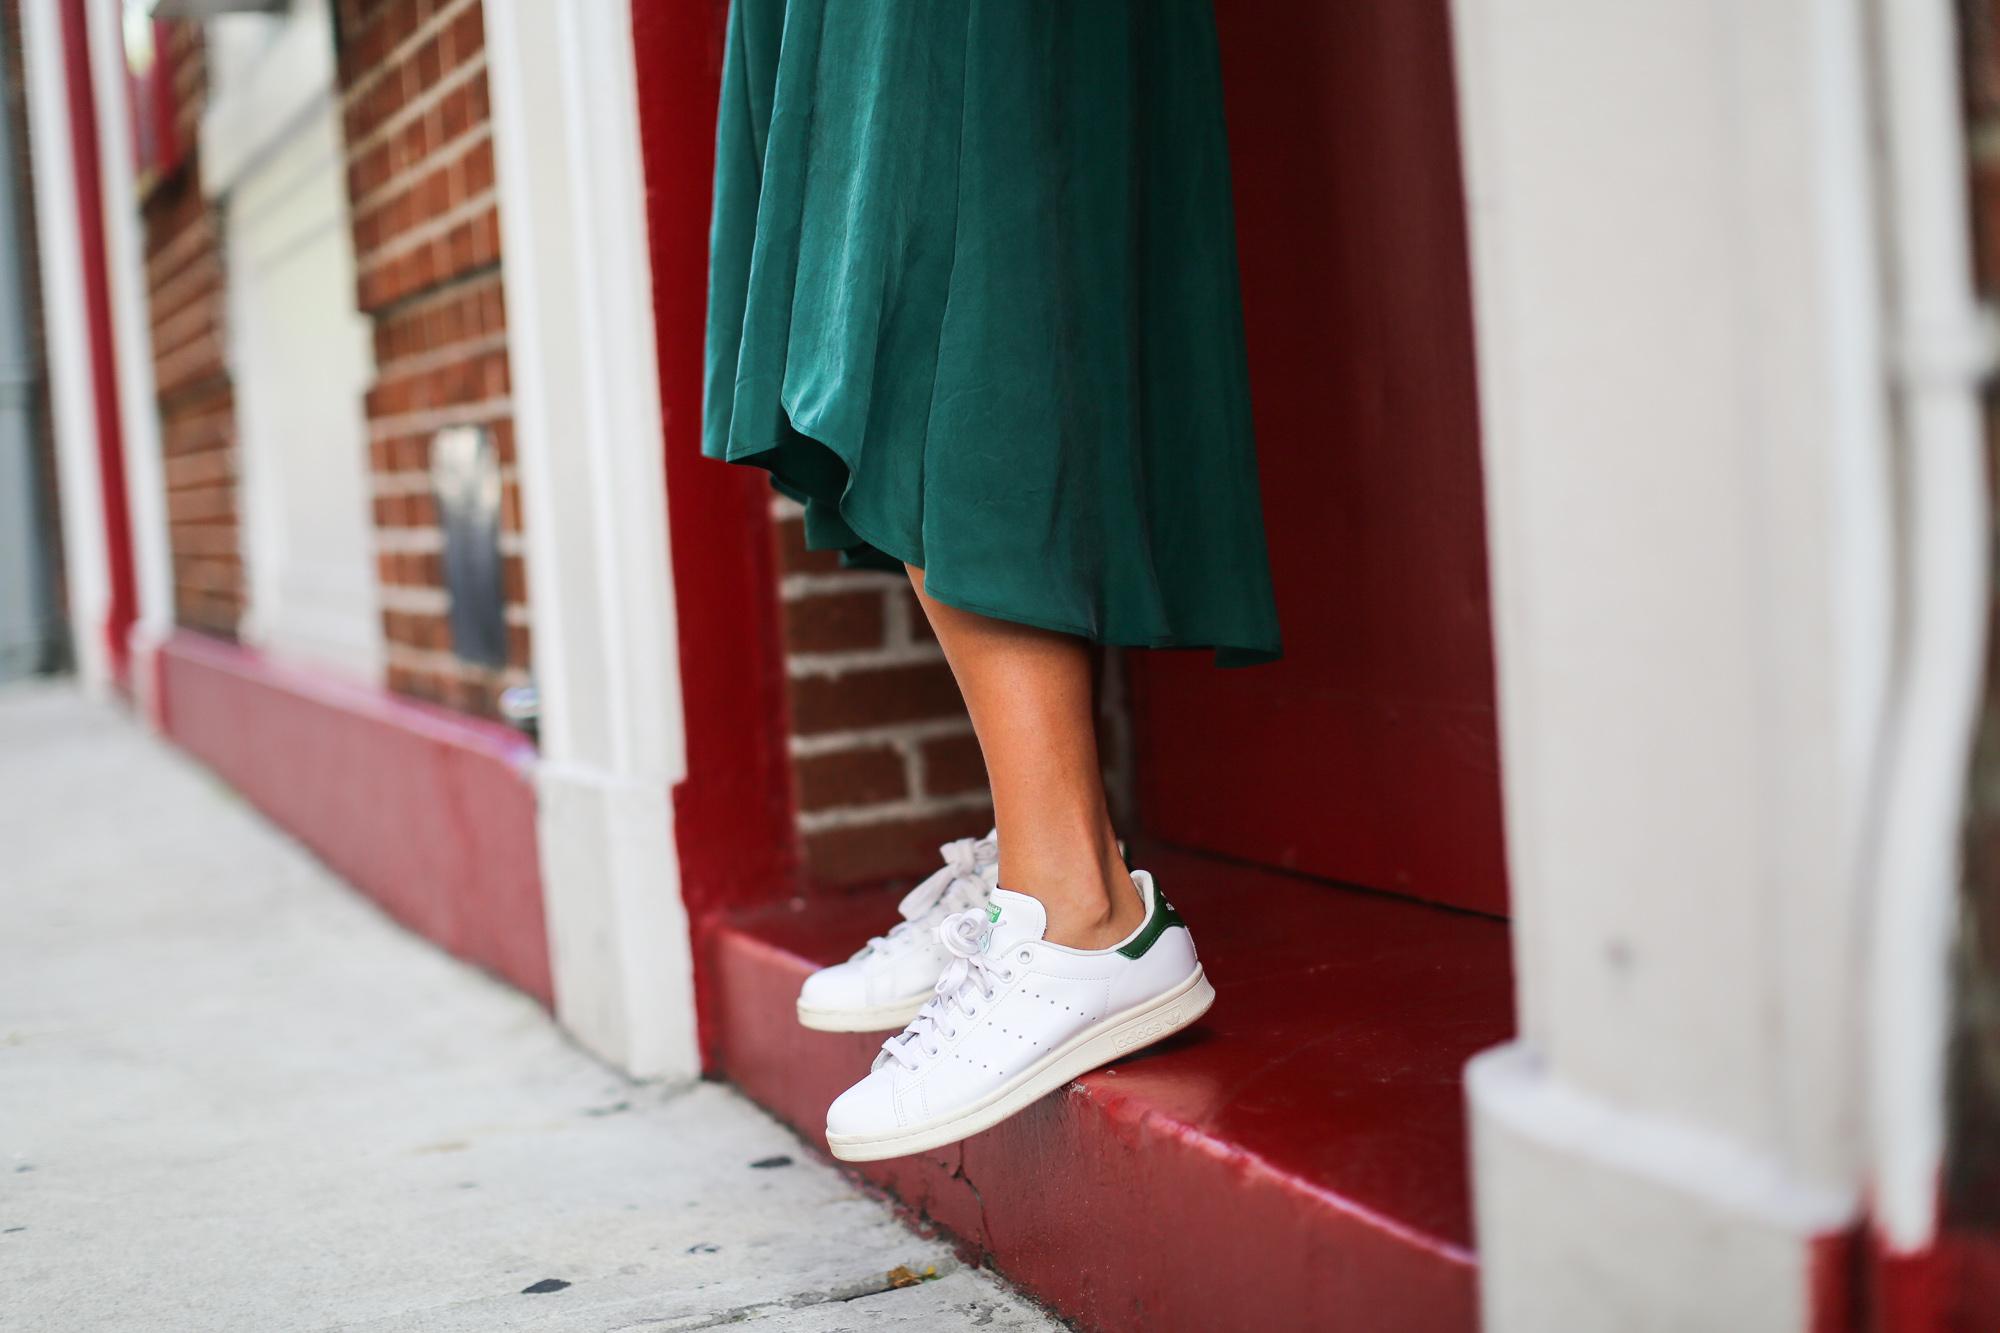 Clochet_streetstyle_newyork_h&m_trend_green_midi_skirt_adidas_stansmith-8